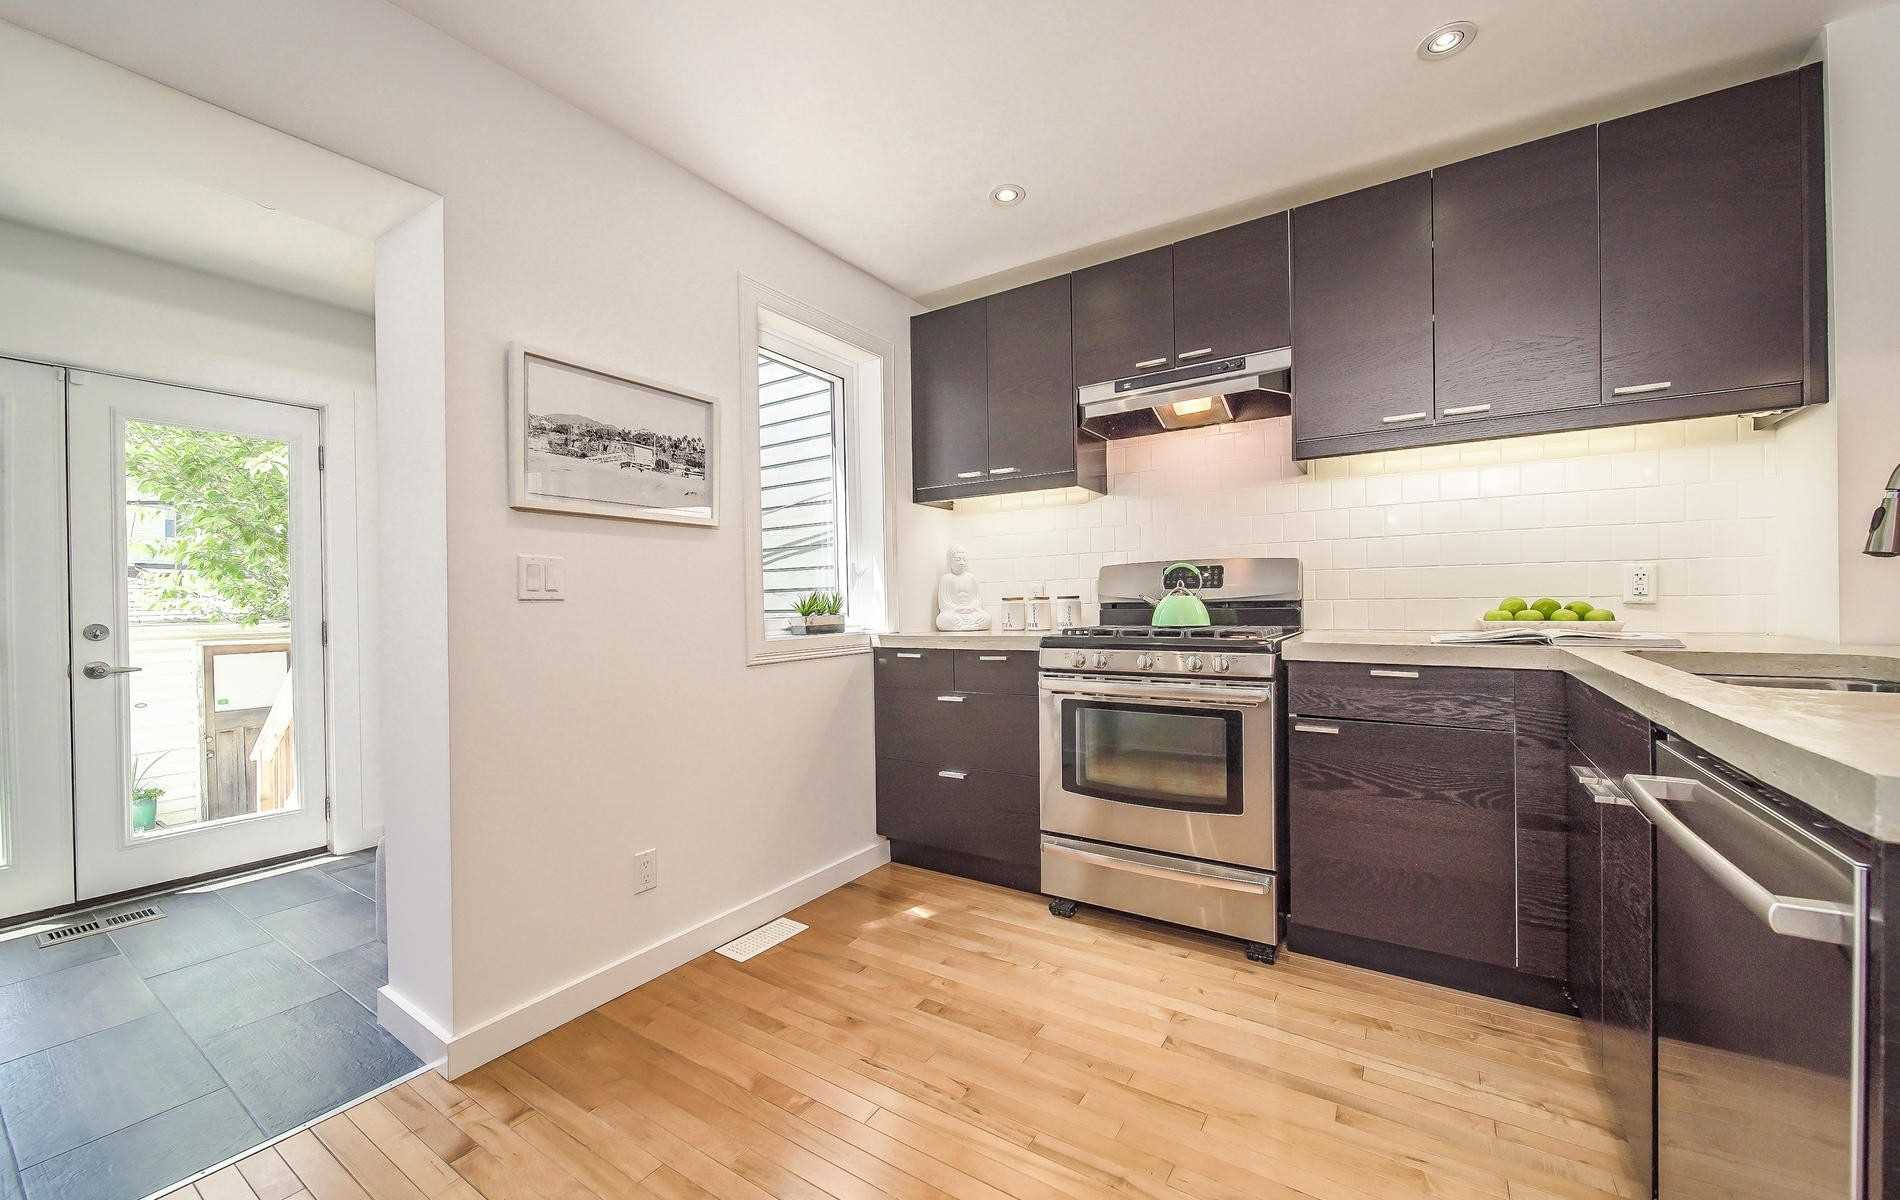 Photo 7: Photos: 64 Larchmount Avenue in Toronto: South Riverdale House (2-Storey) for sale (Toronto E01)  : MLS®# E4489752